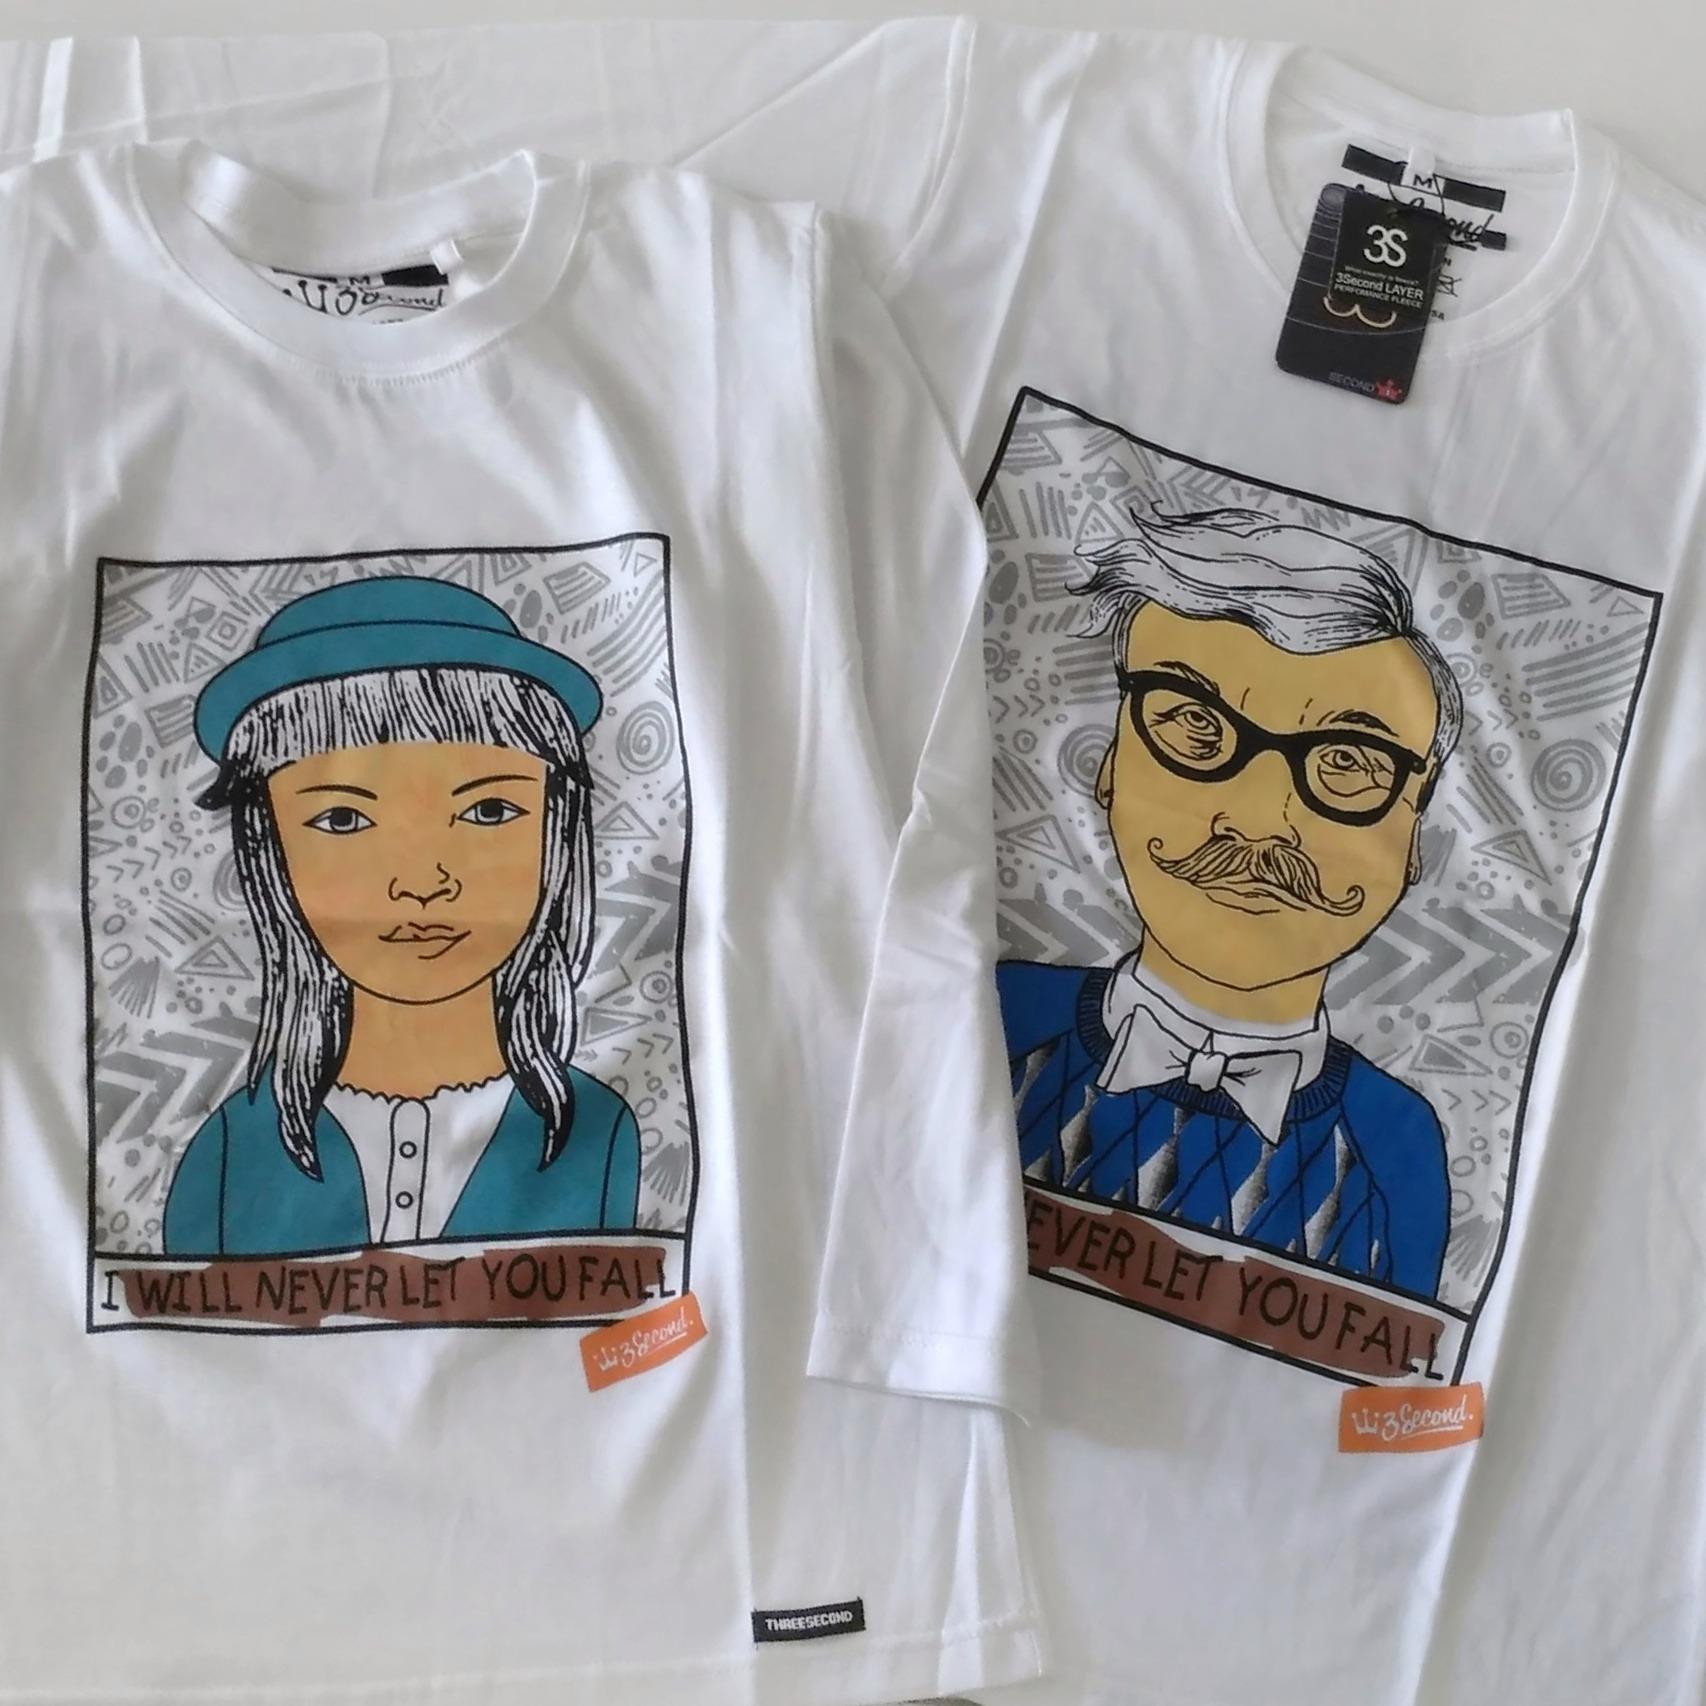 Cek Harga Baru Kaos Couple 3second Lengan Panjang Warna Putih Baju Unisex Gambar Produk Rinci Pasangan Wanita Terkini